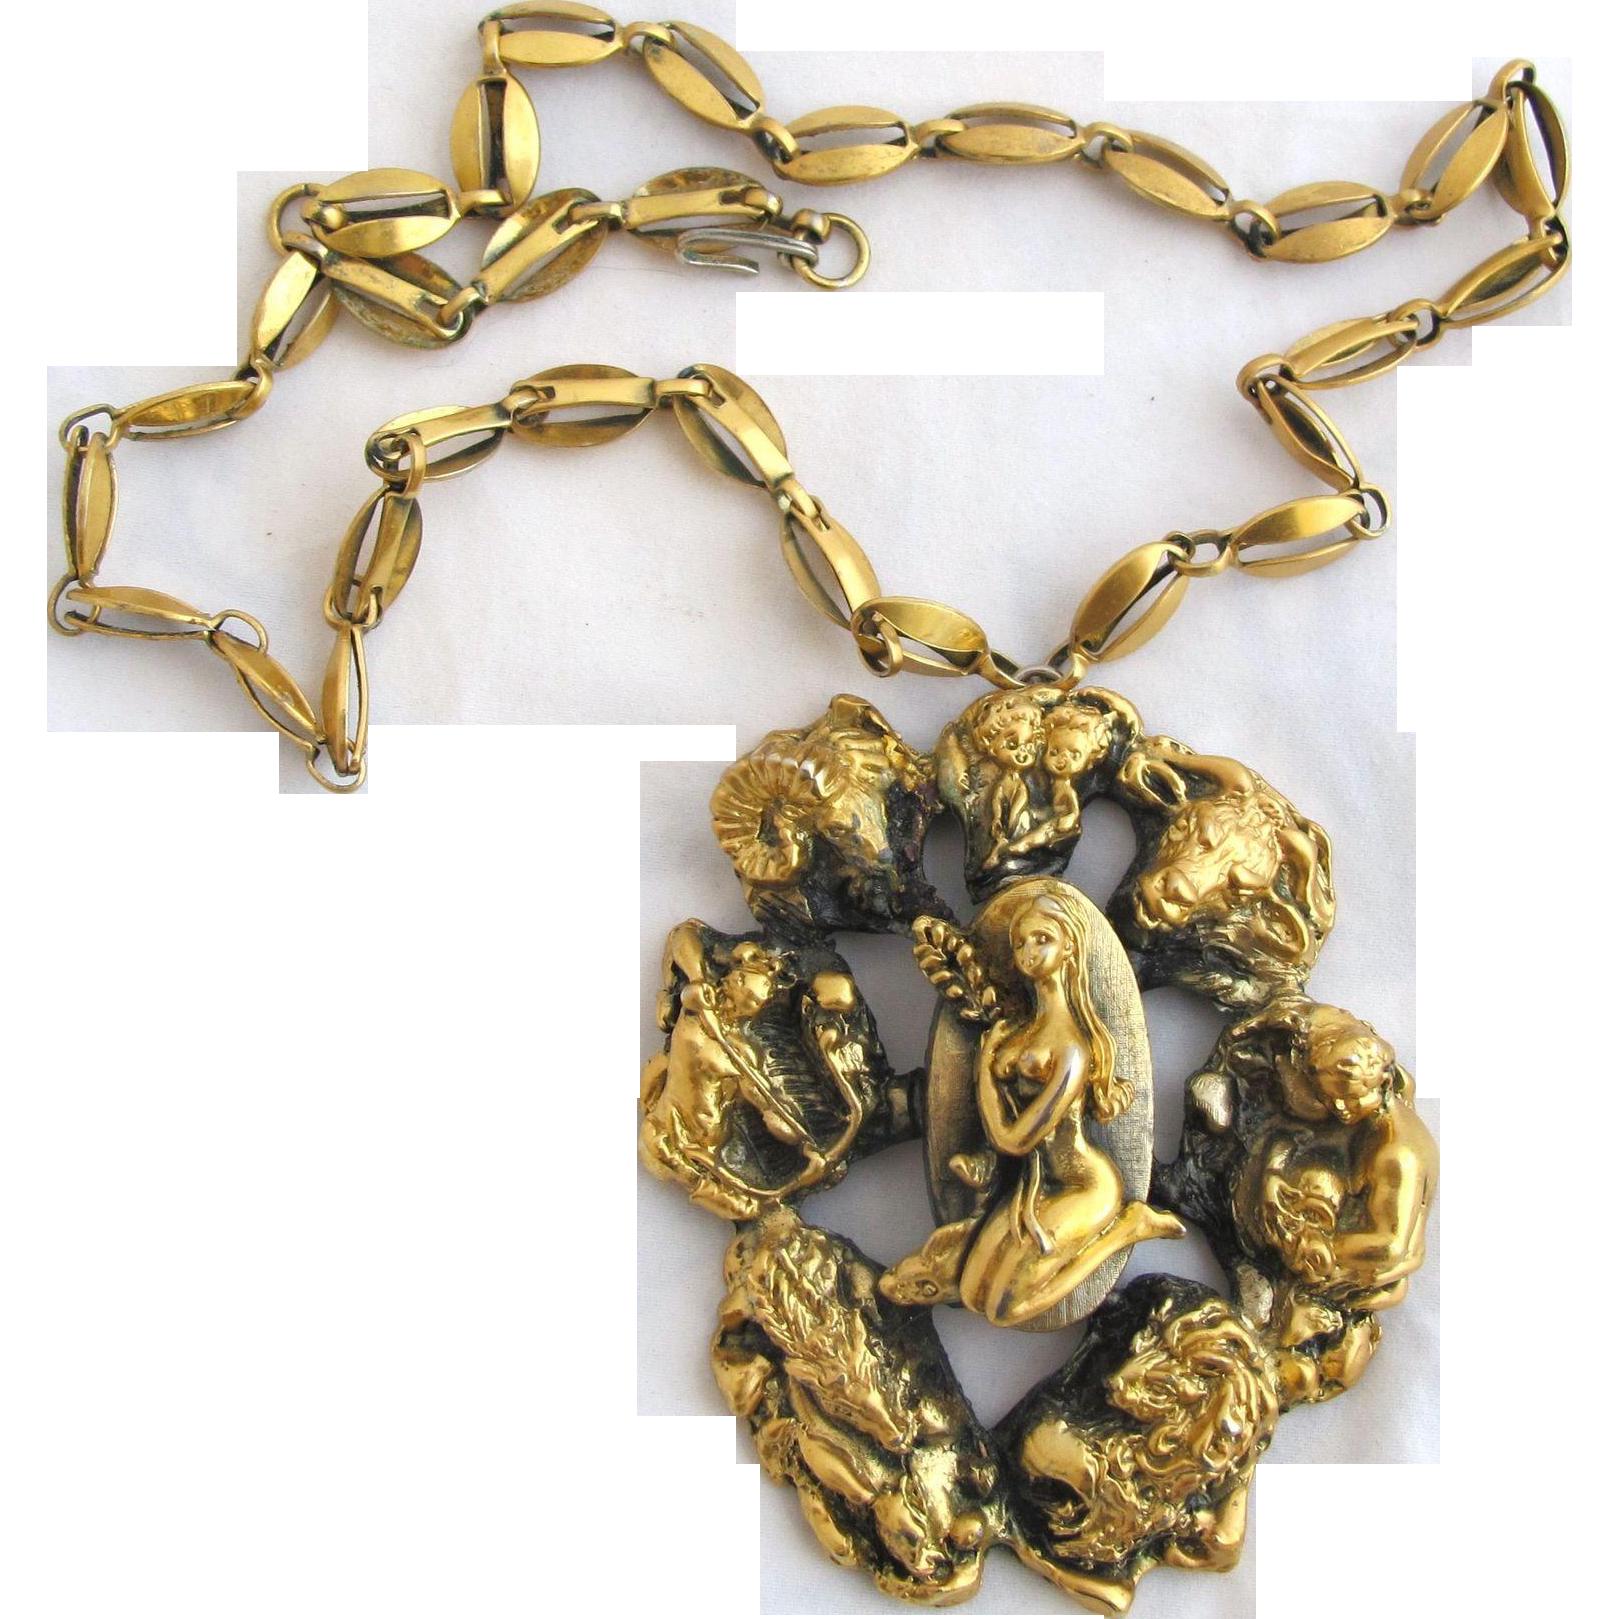 Vintage Tortolani Huge Zodiac Pendant Necklace Favorite Vintage